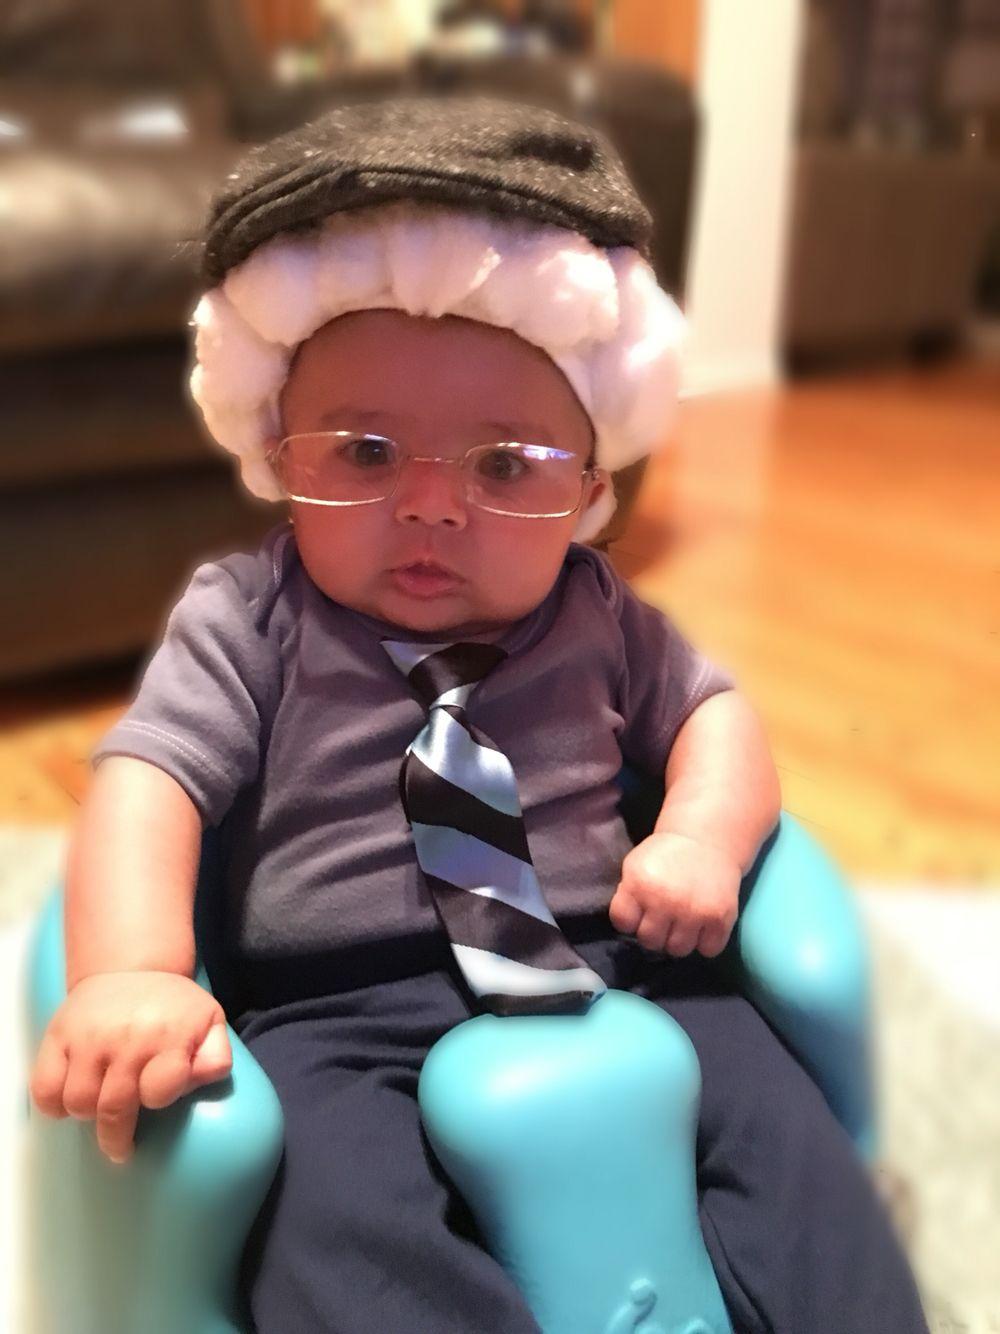 Little old man baby costume | Diy | Toddler halloween ...